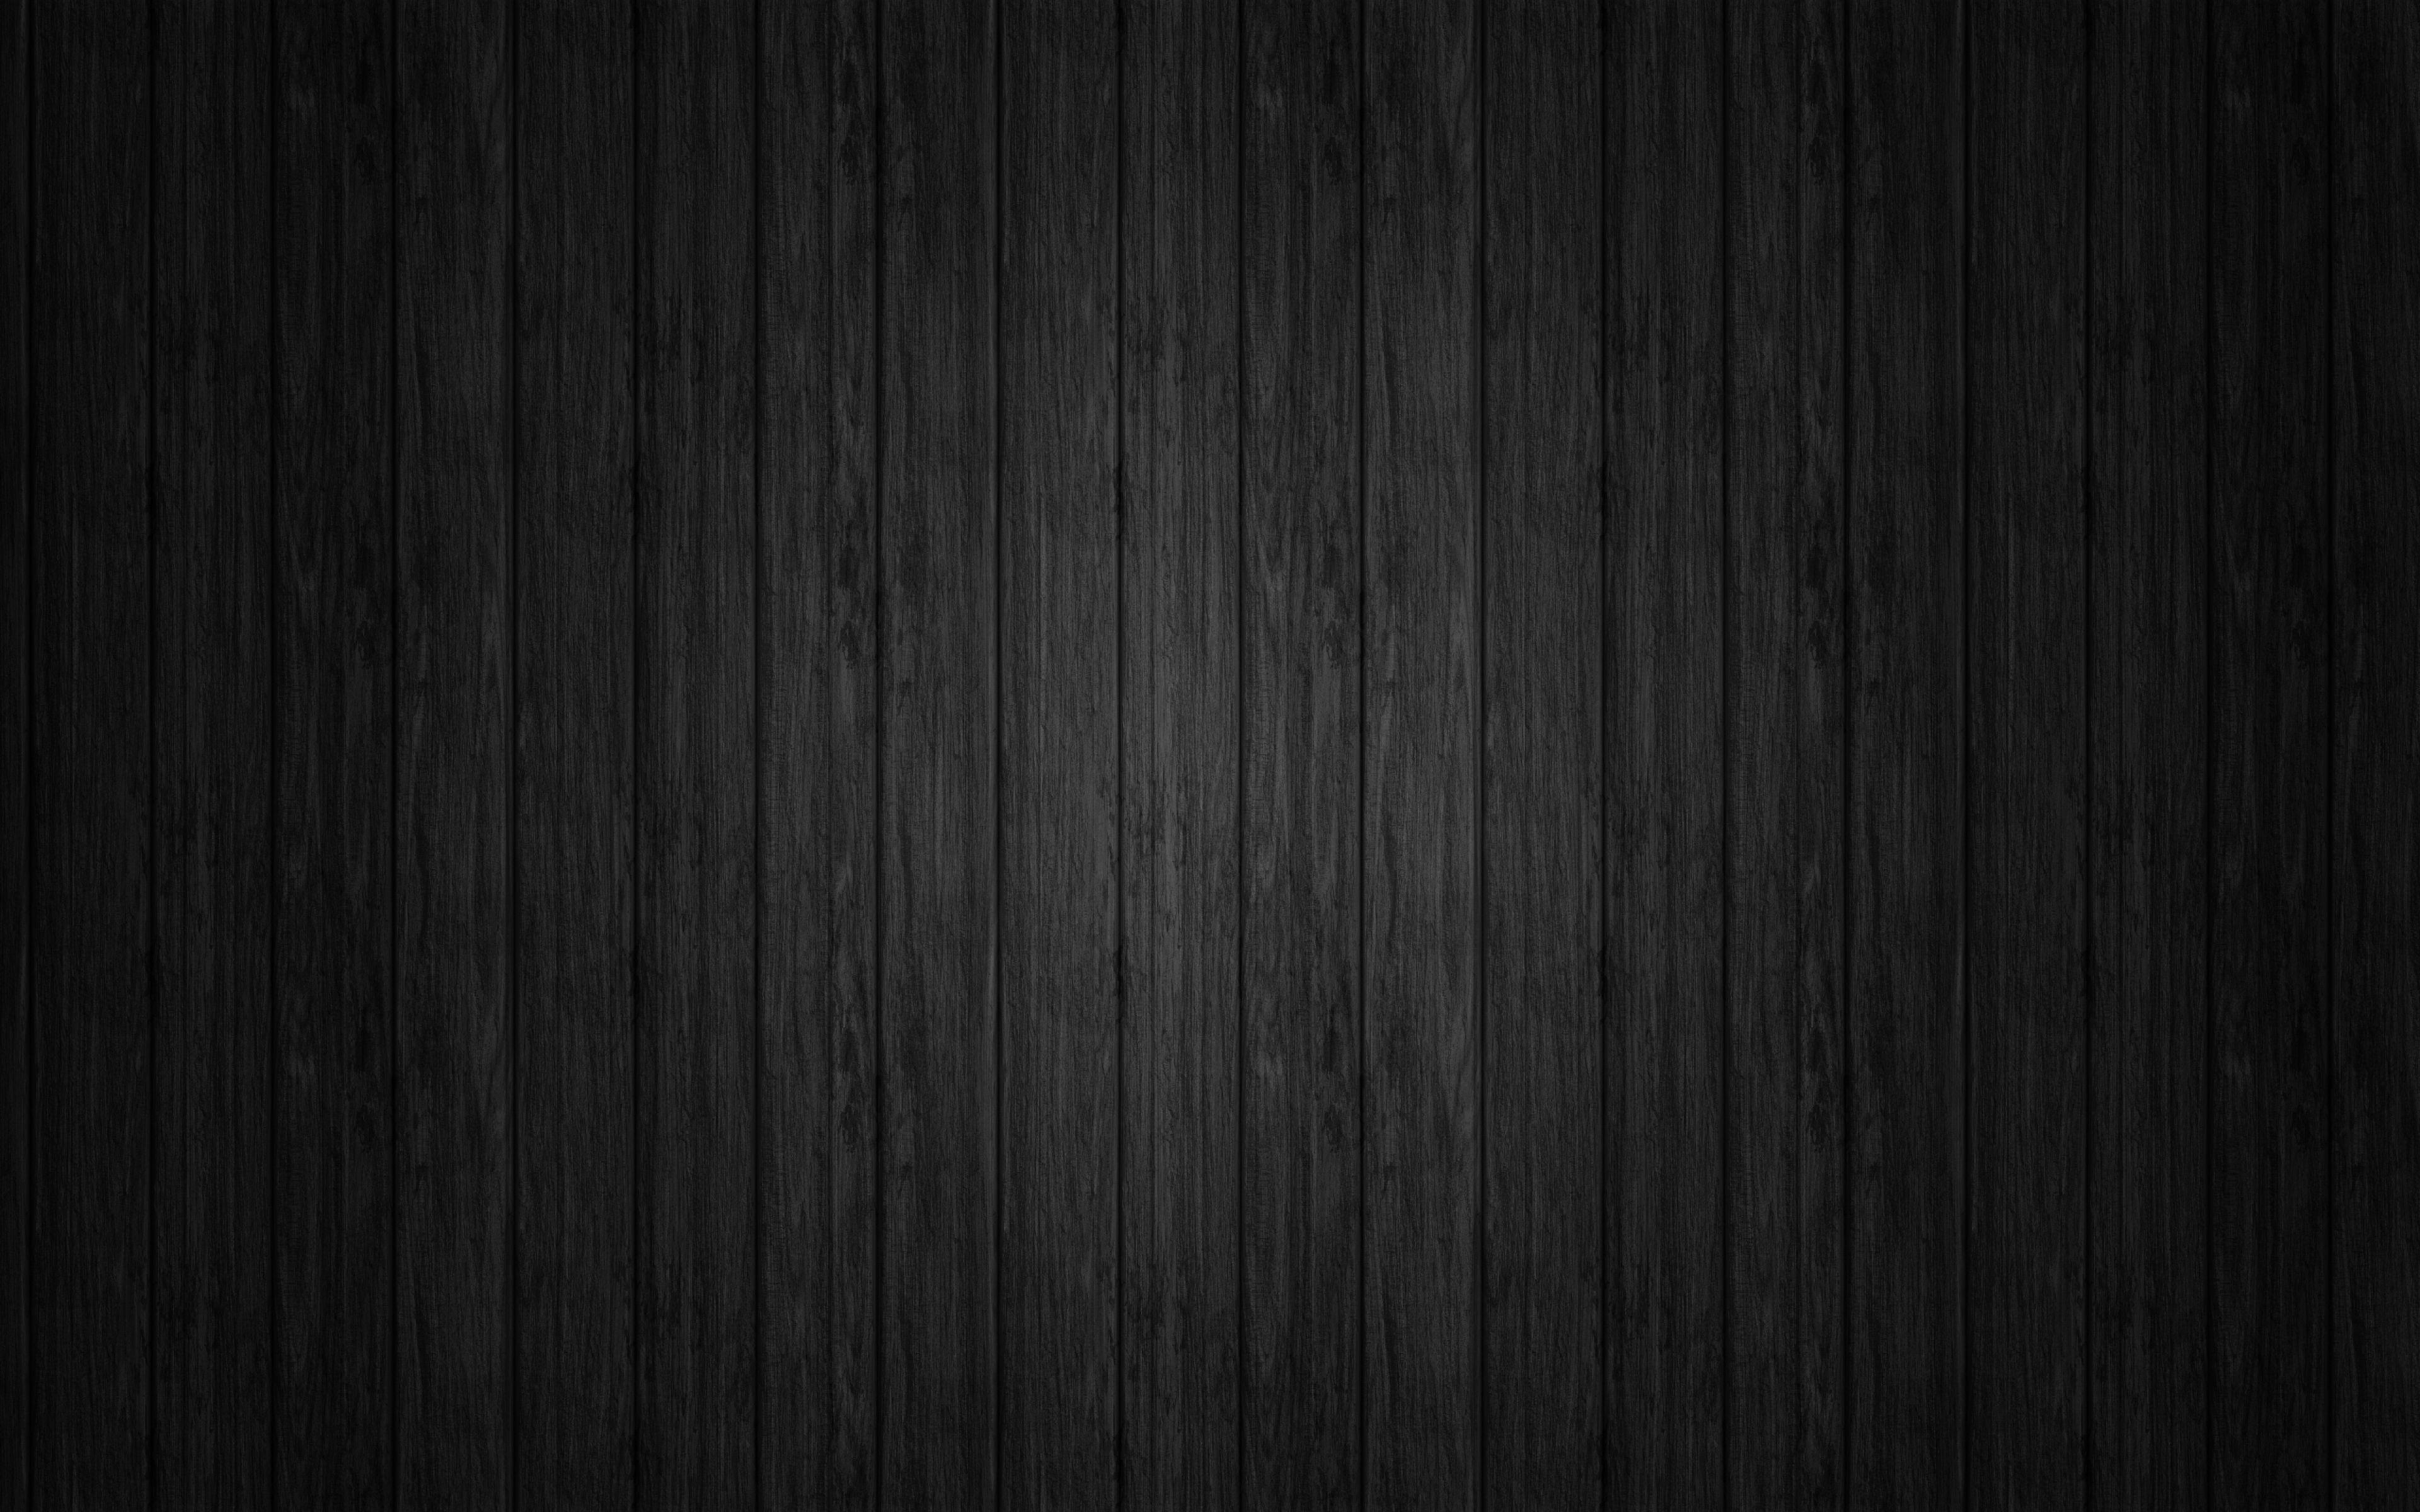 Free Wood Backgrouns Wallpapers Backgrounds Images Art Photos Desain Banner Seni Desain